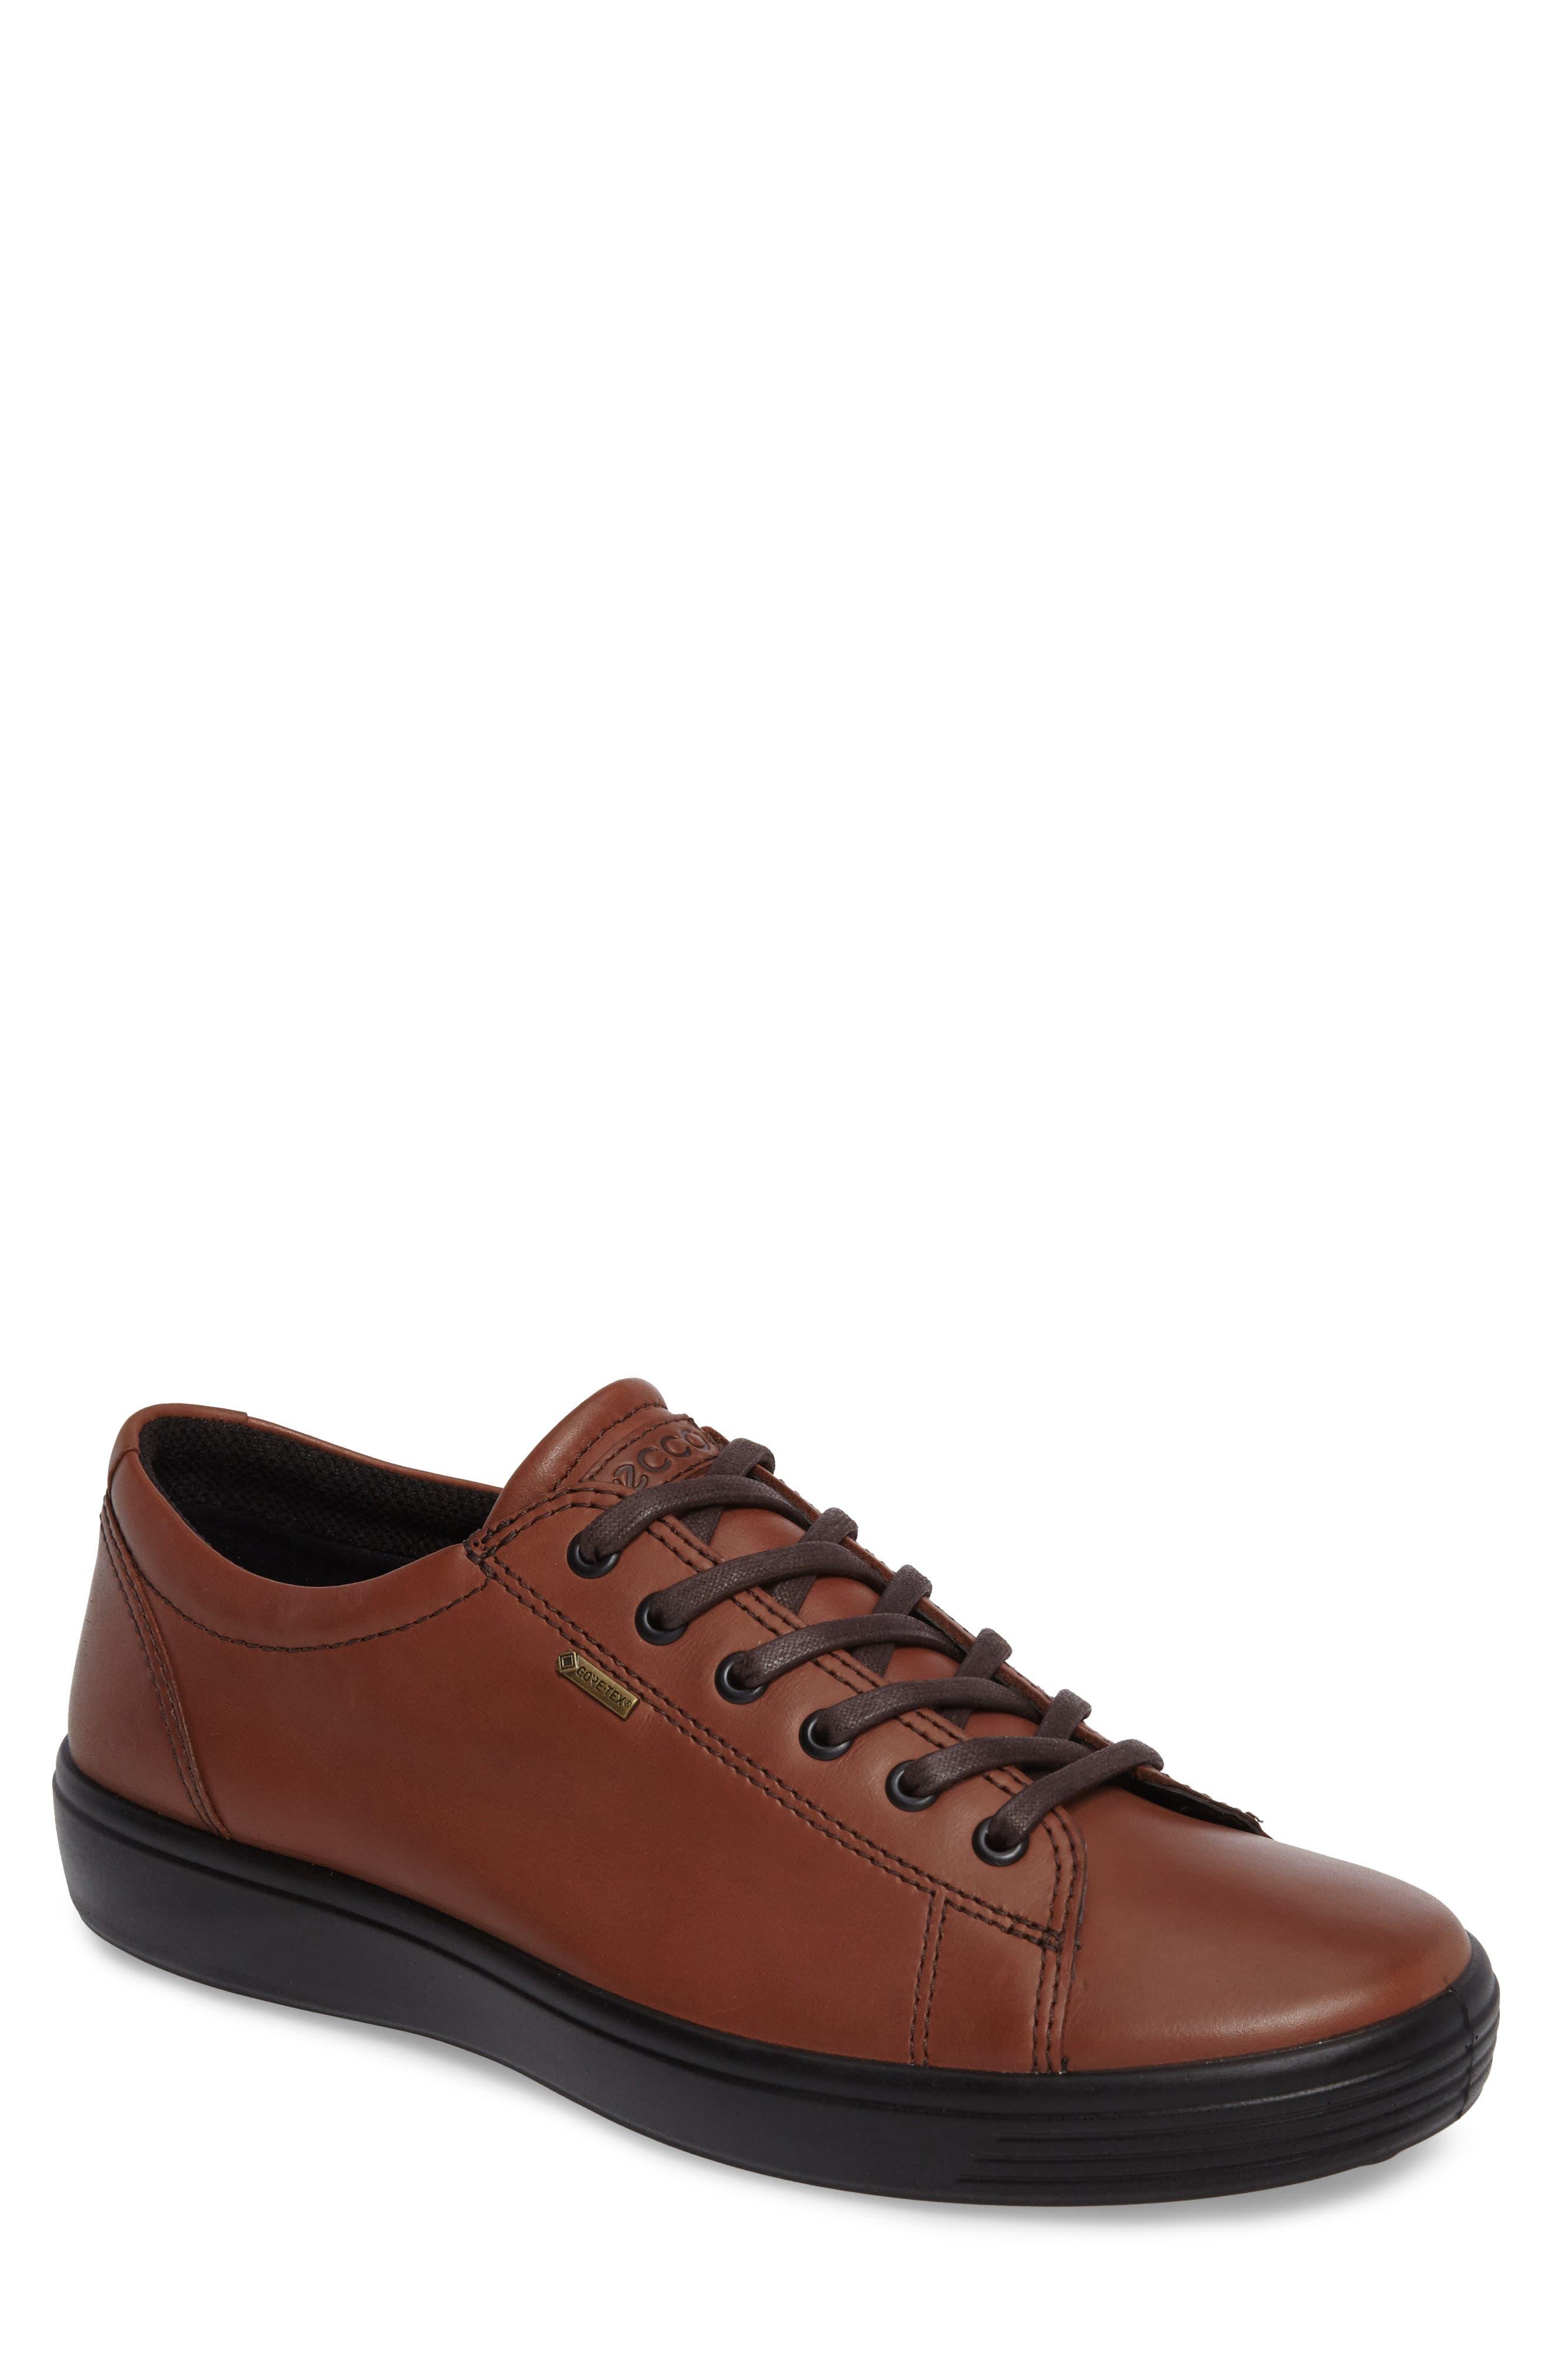 ECCO Soft 7 Low Sneaker (Men)